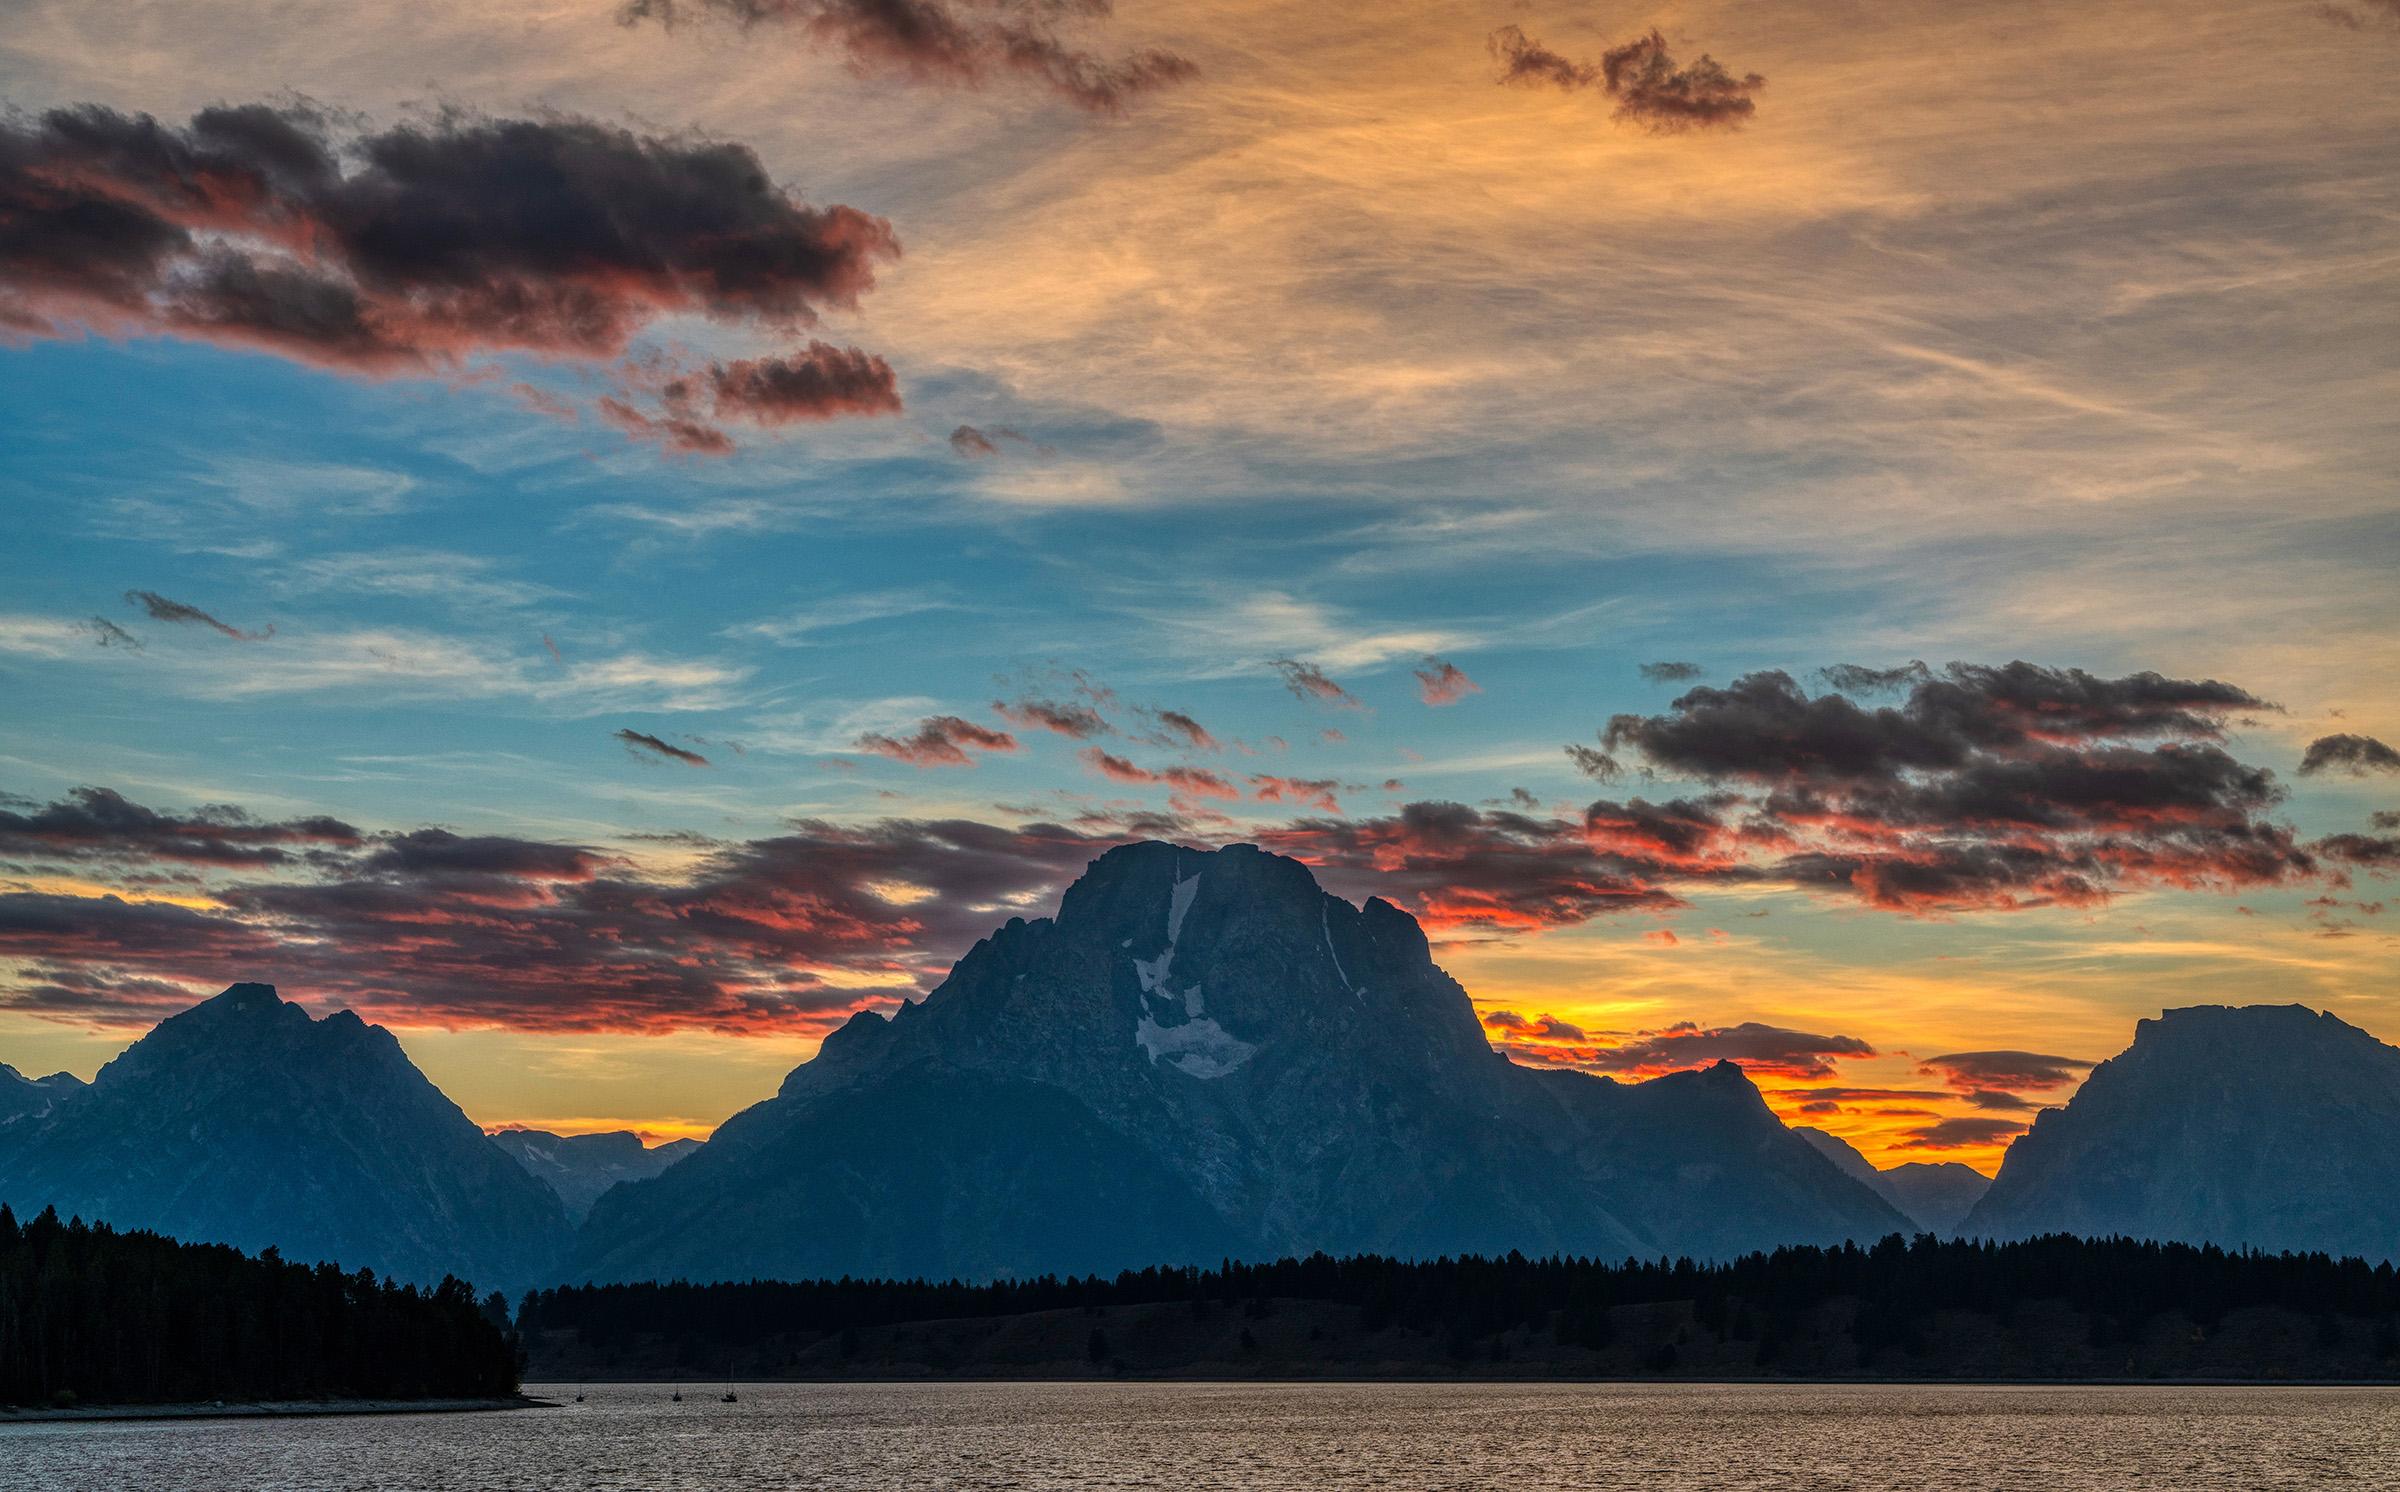 #sky, #grandteton, #nationalpark, #mountmoran, #sunset, #clouds, #backlit, #aurorahdr, #sony, #gtnp, #landscape